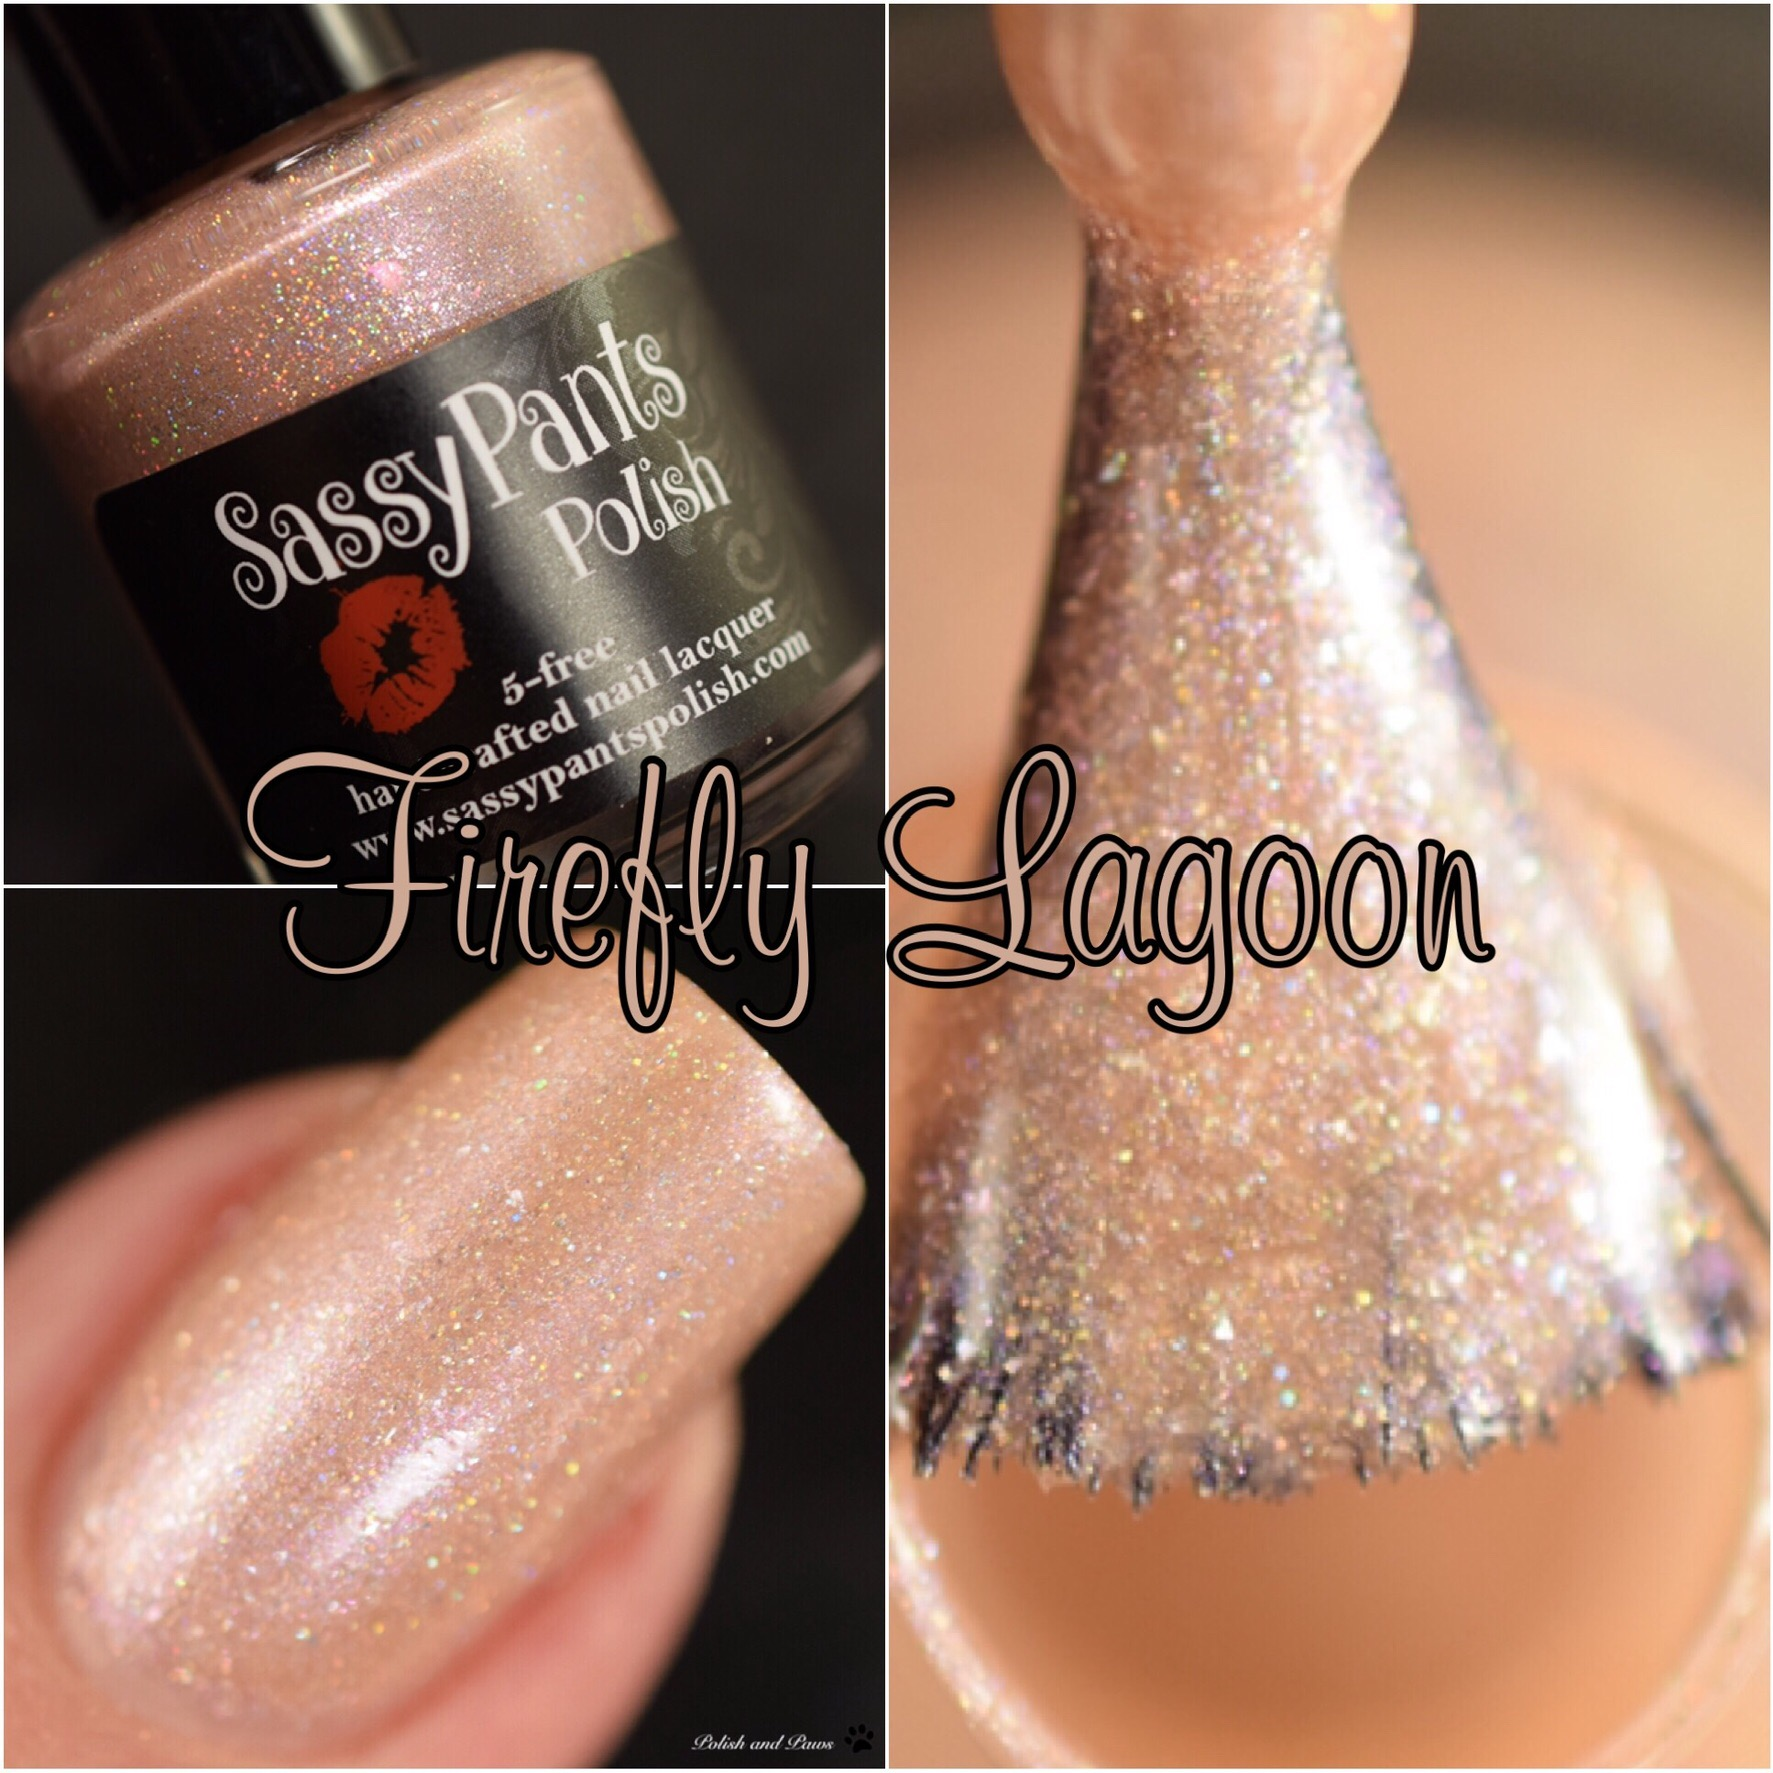 Sassy Pants Polish Firefly Lagoon